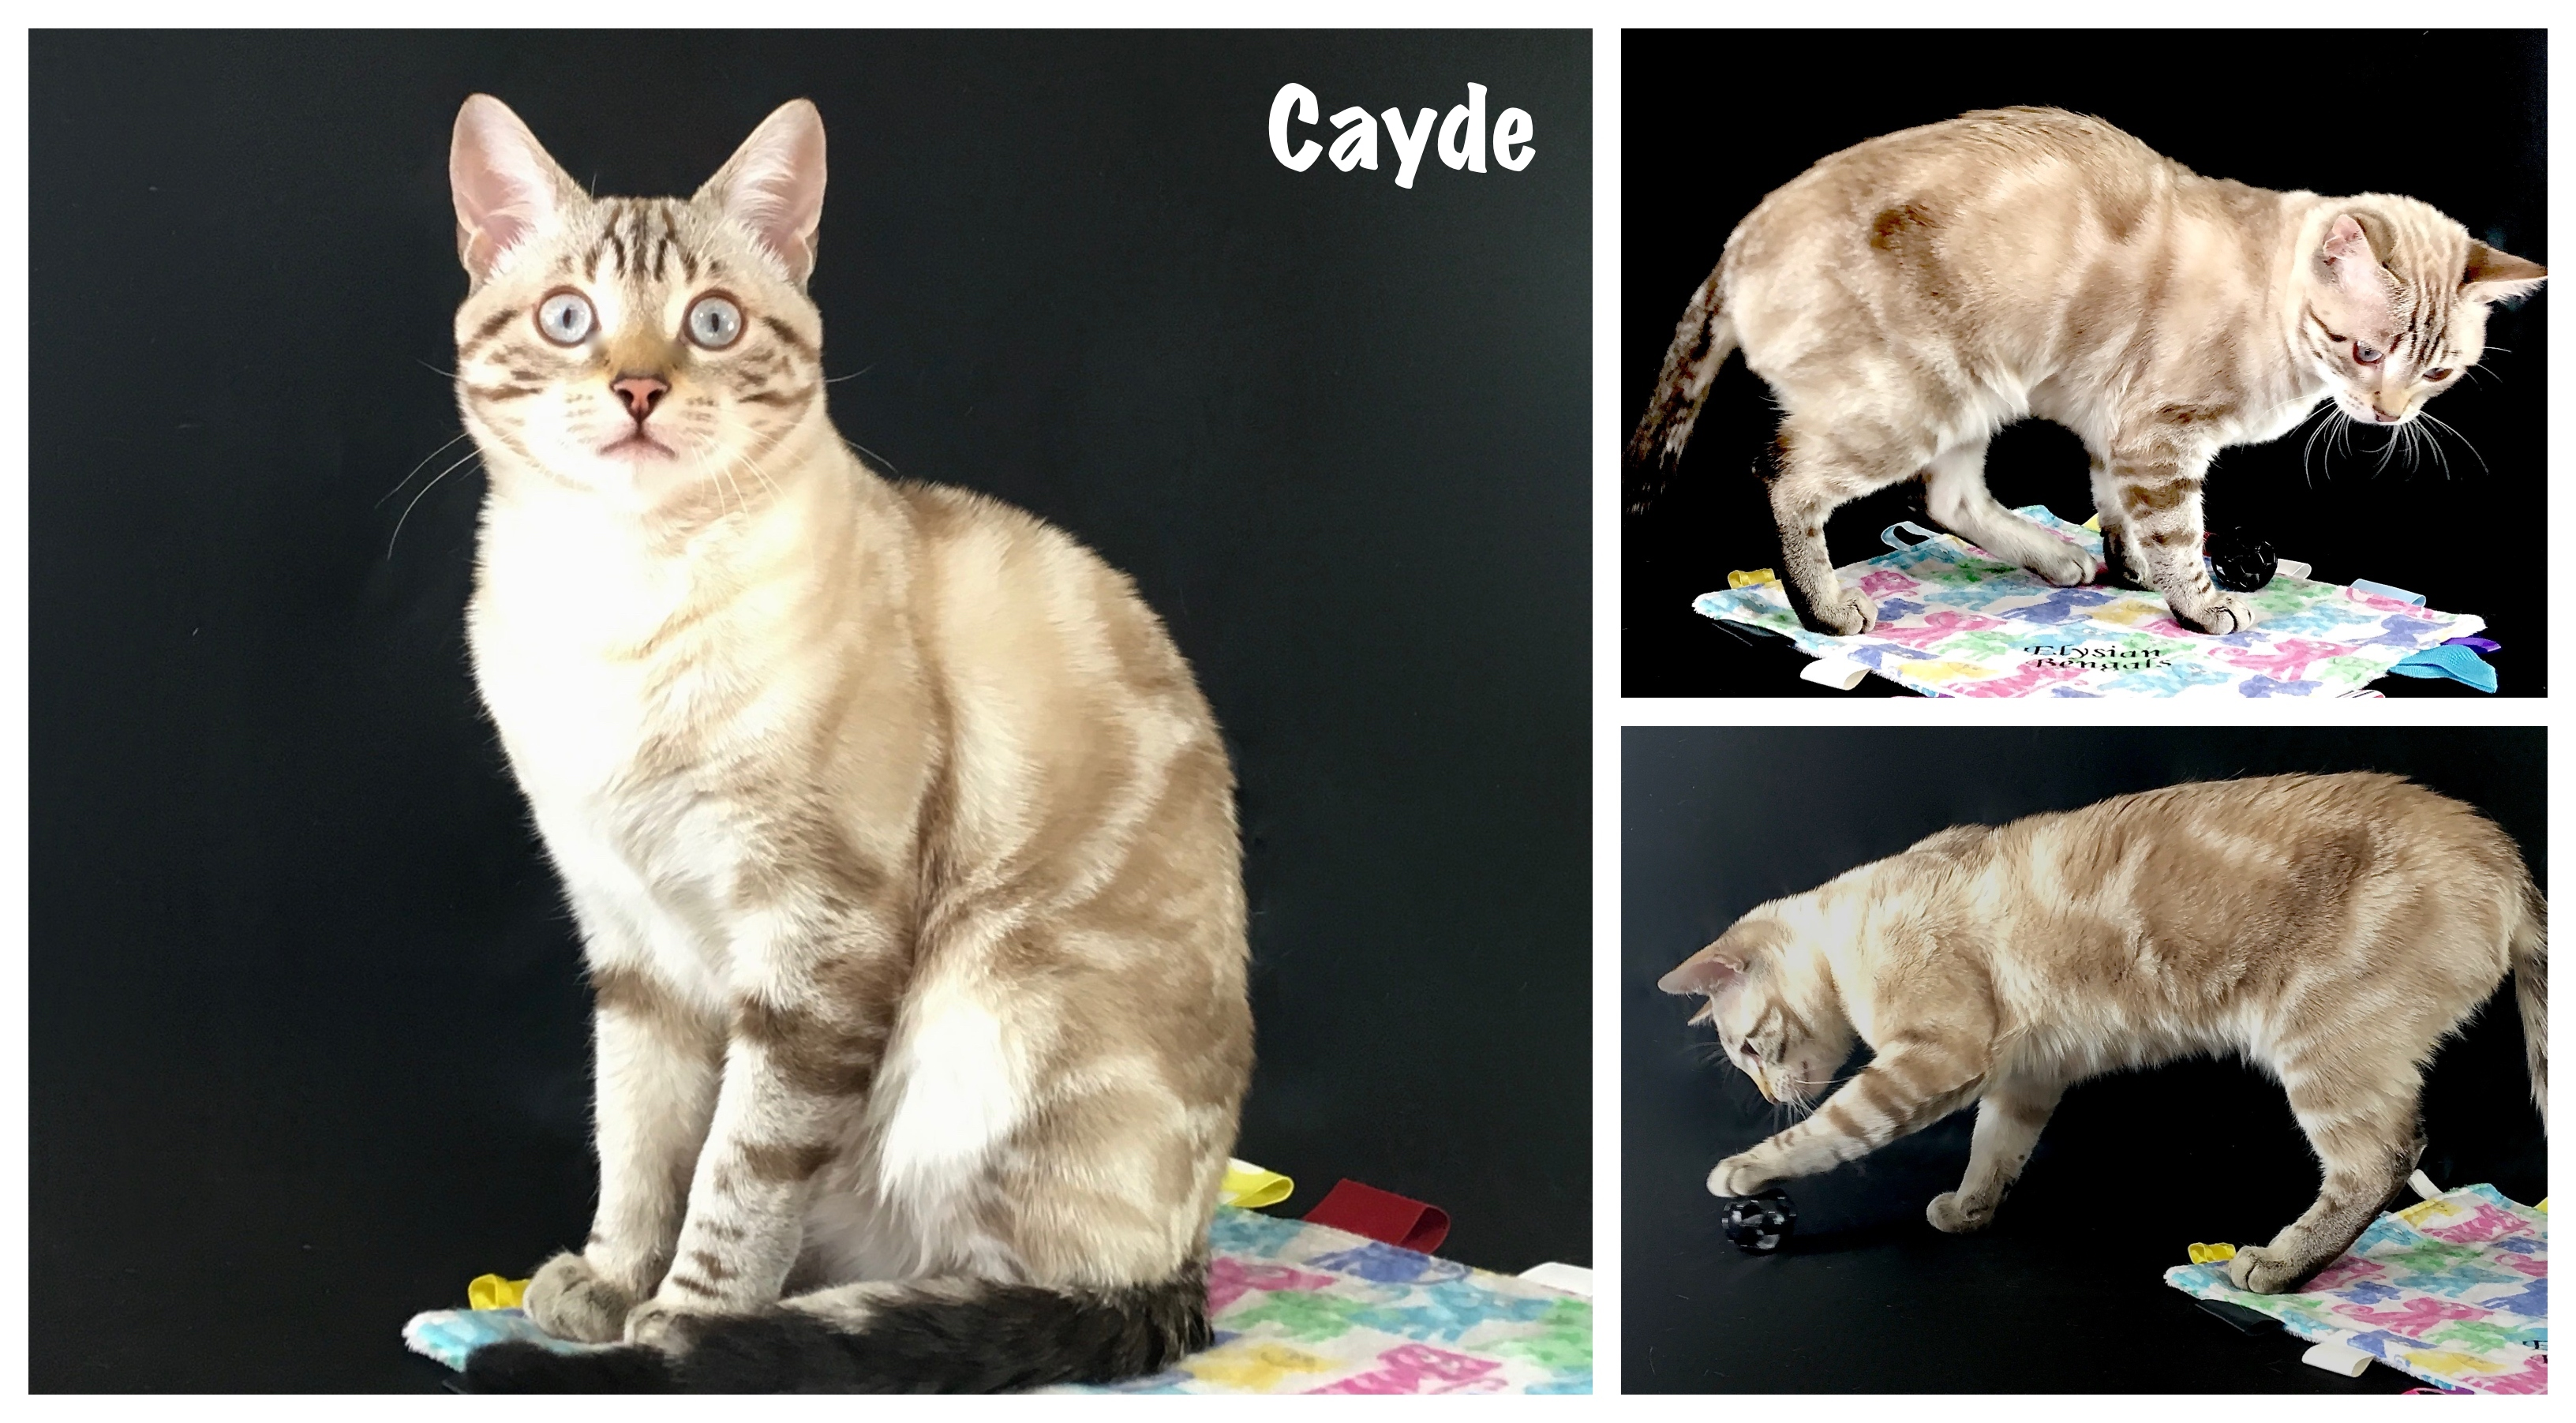 Cayde 23 weeks